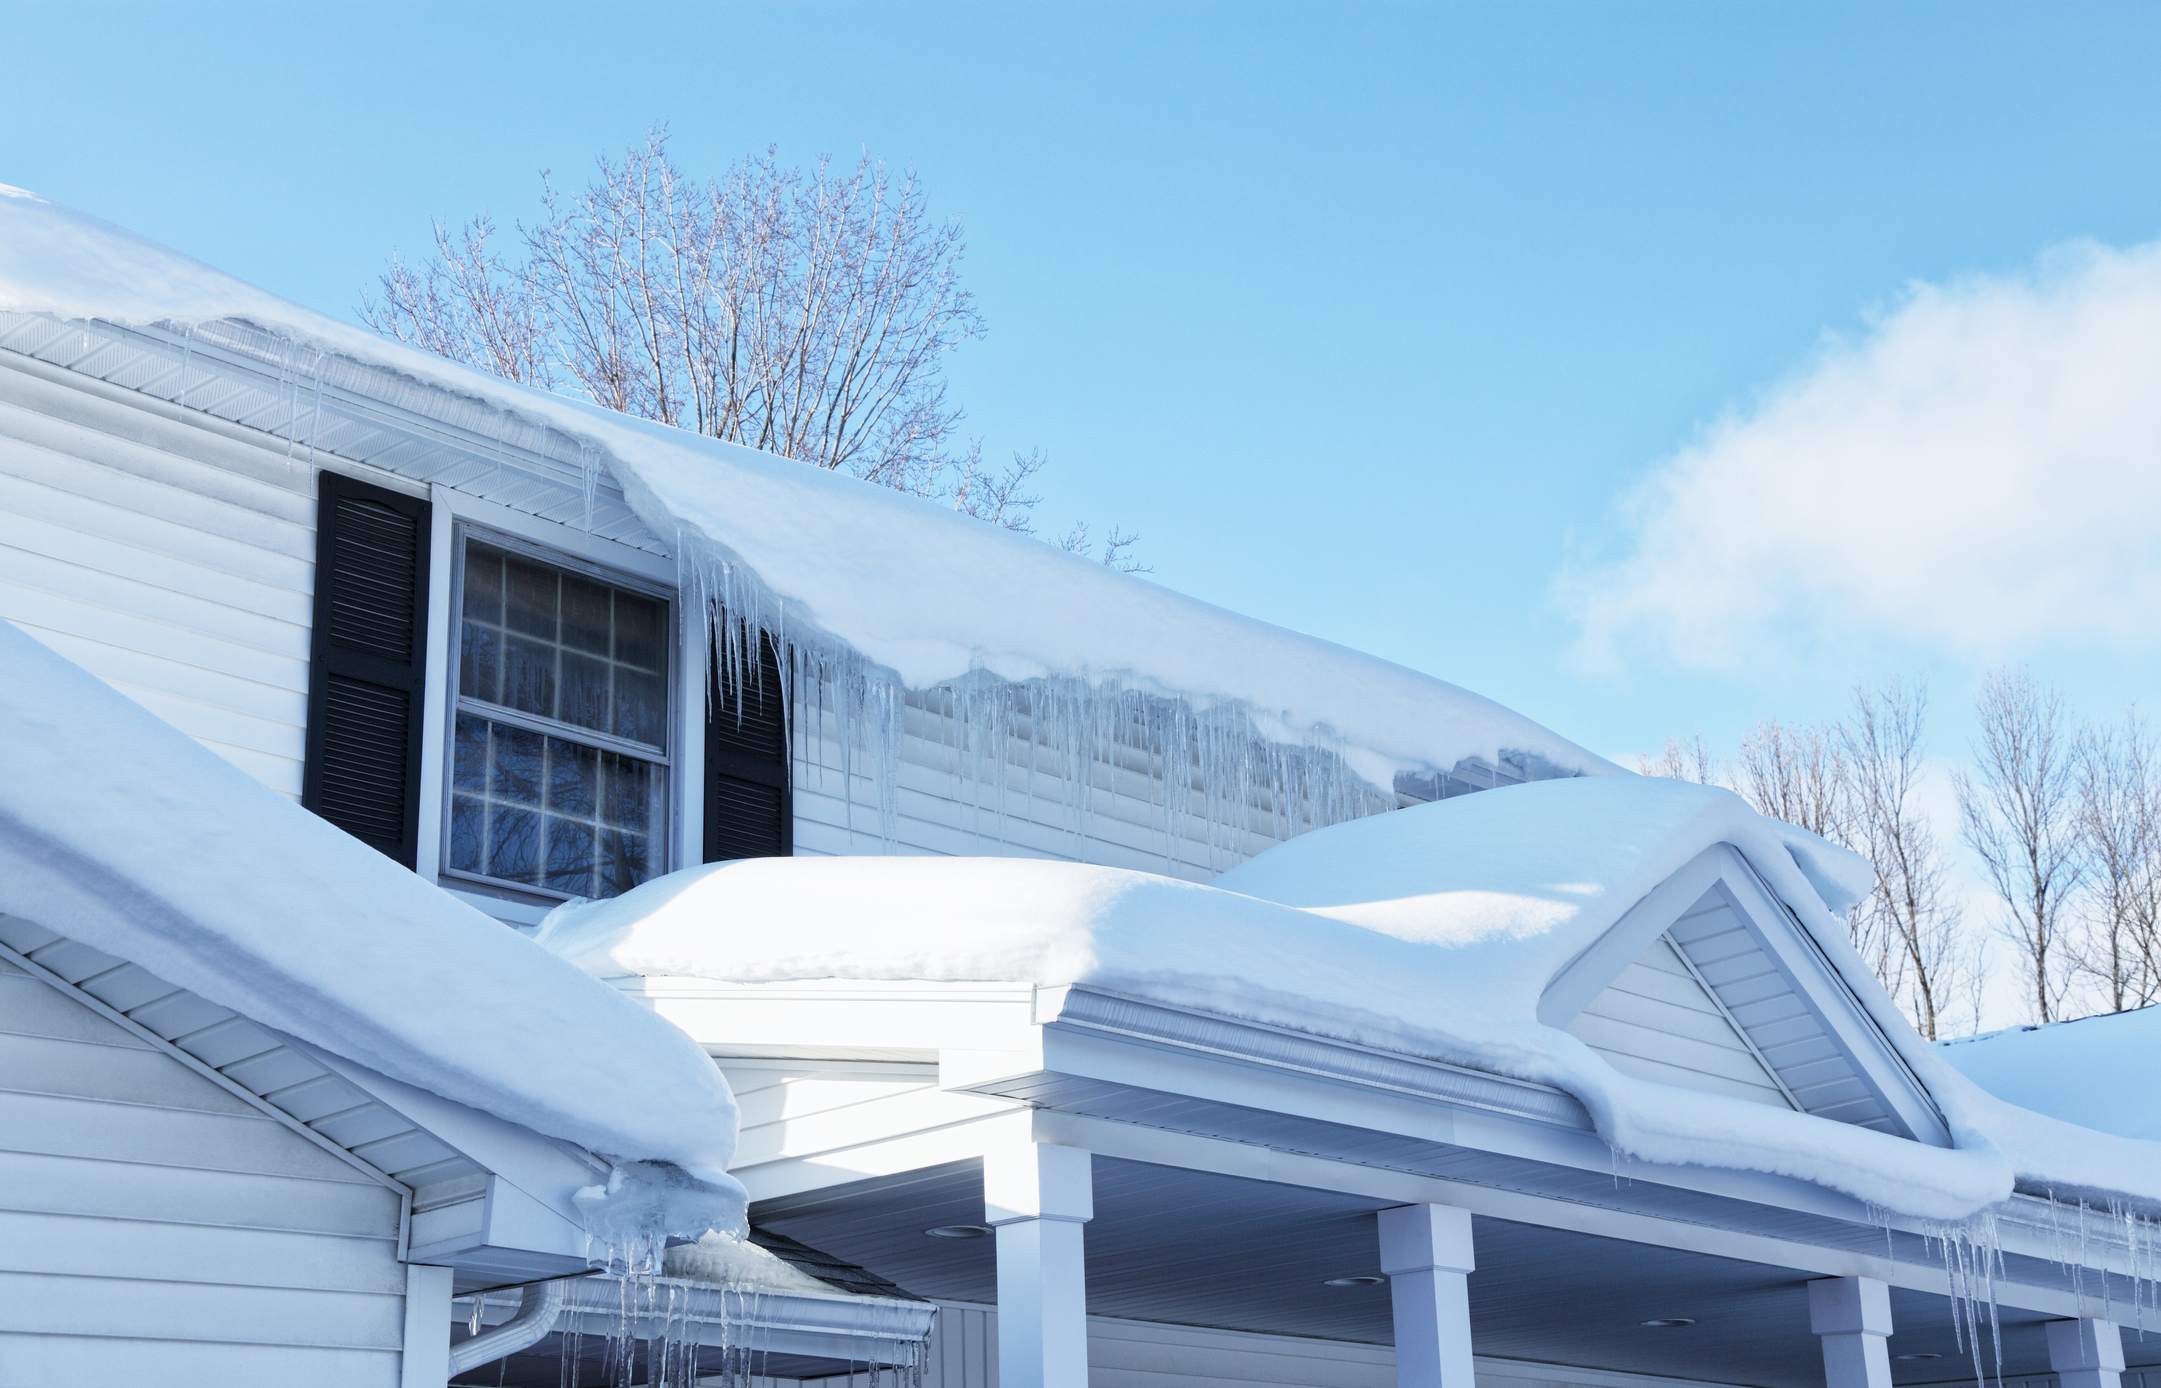 Ice Dam Roof Damage